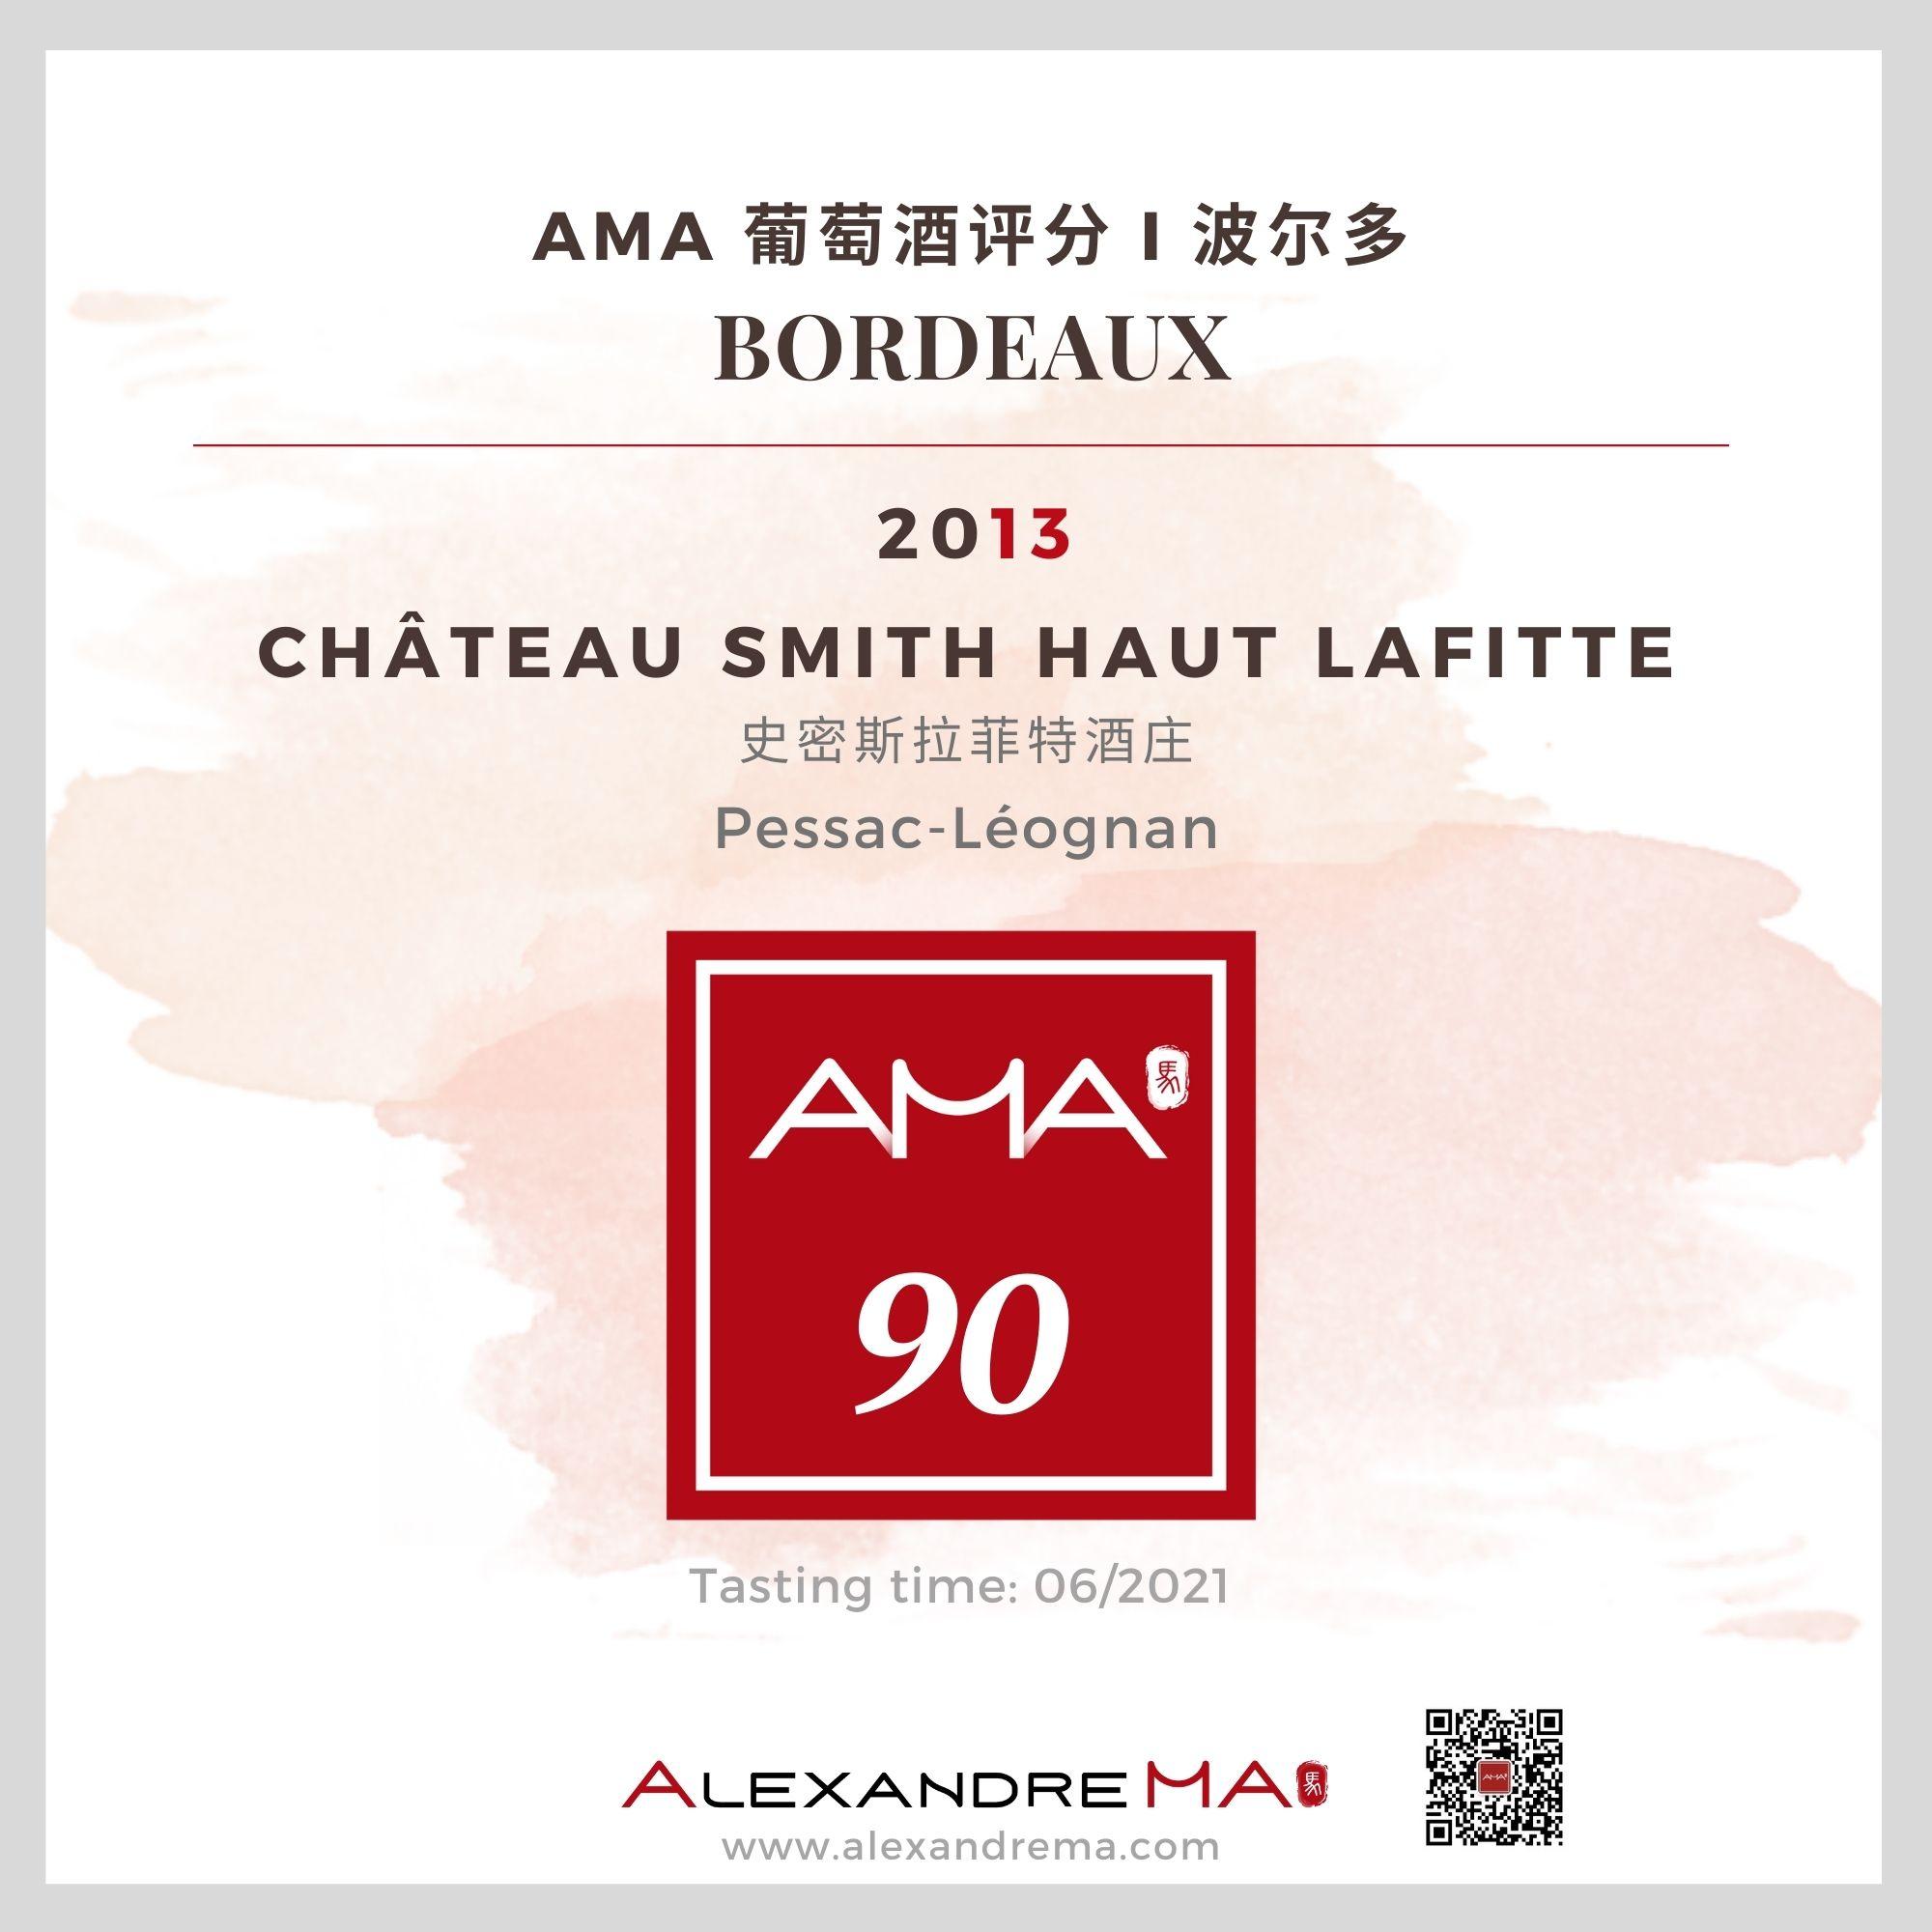 Château Smith Haut Lafitte 2013 史密斯拉菲特酒庄 - Alexandre Ma